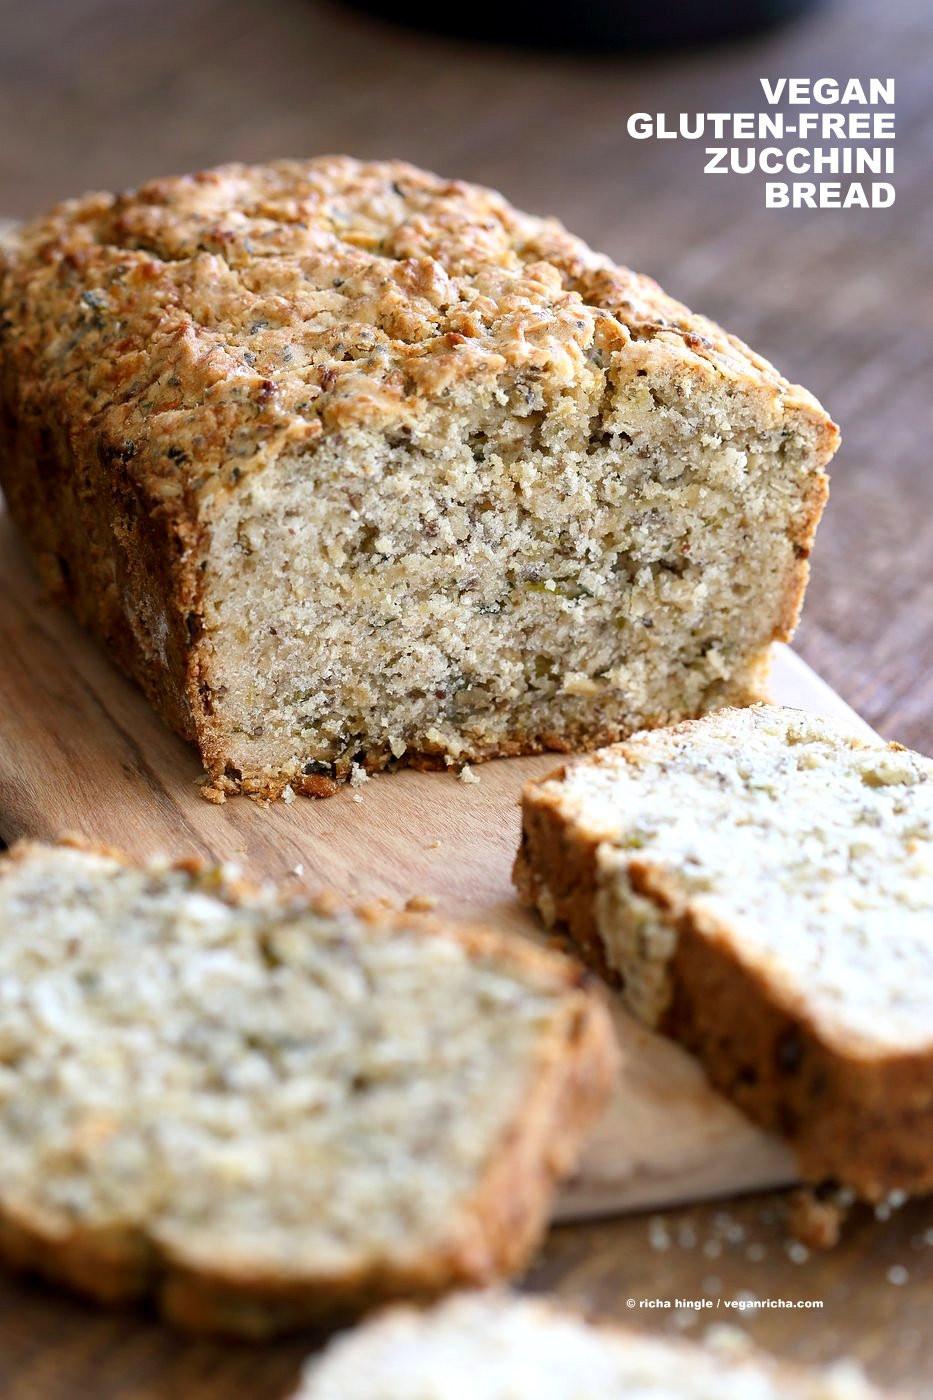 Recipes For Gluten Free Bread  Vegan Gluten free Zucchini Bread Recipe Vegan Richa